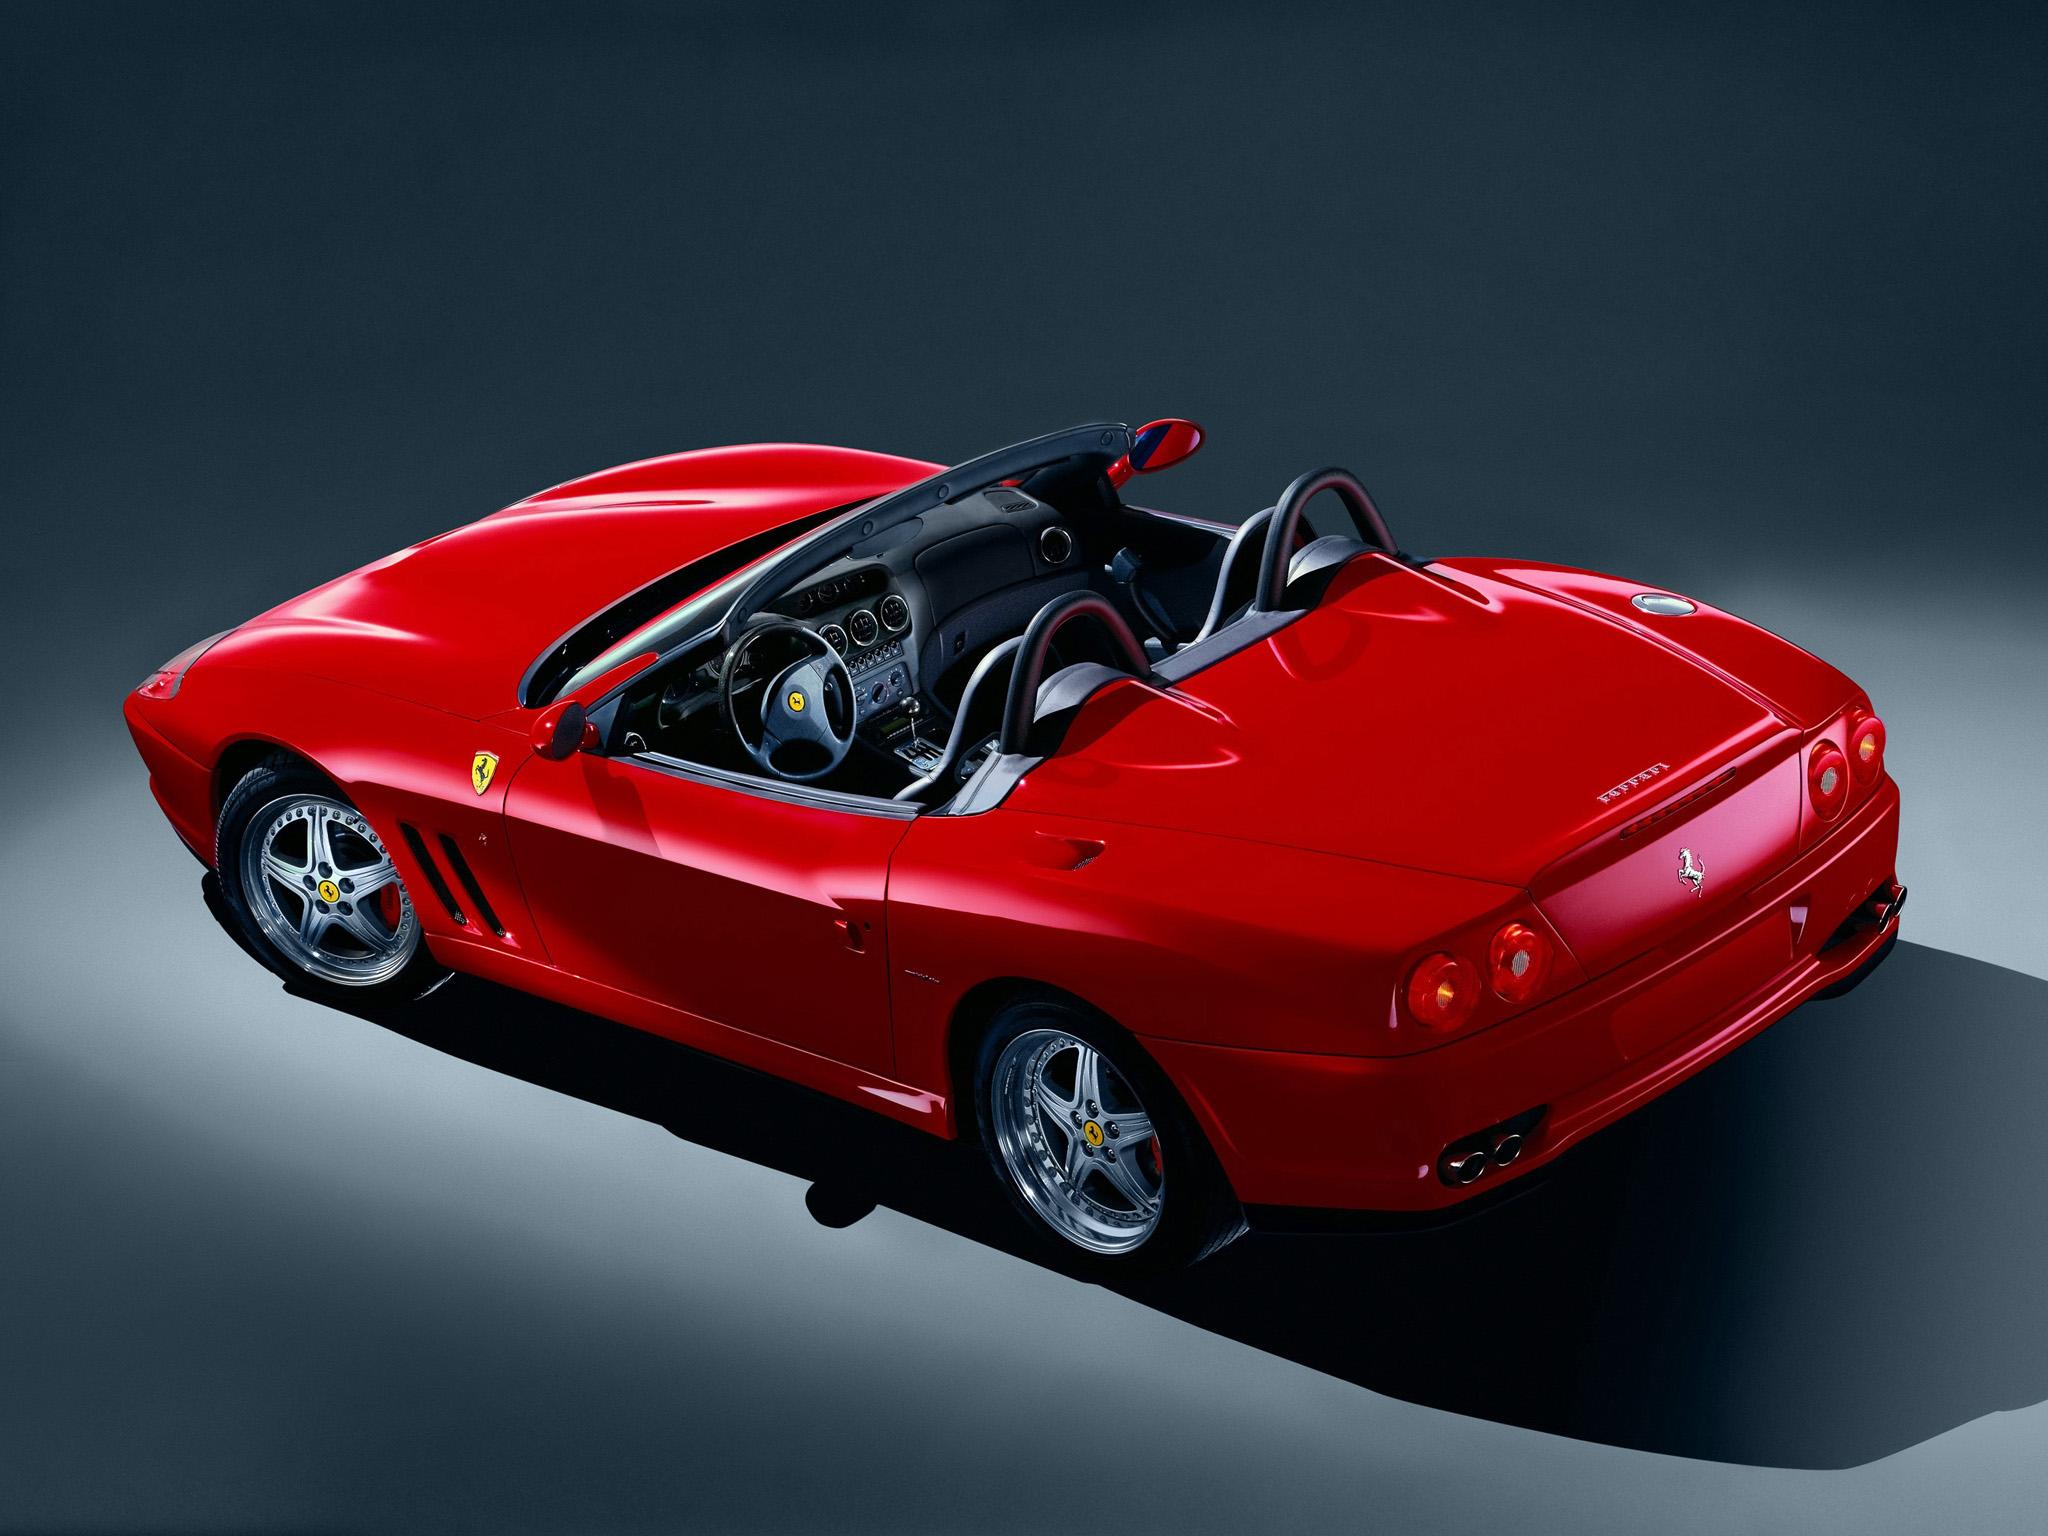 Ferrari-550_Barchetta_mp20_pic_100600 Fabulous Ferrari Mondial 8 Super Elite Cars Trend